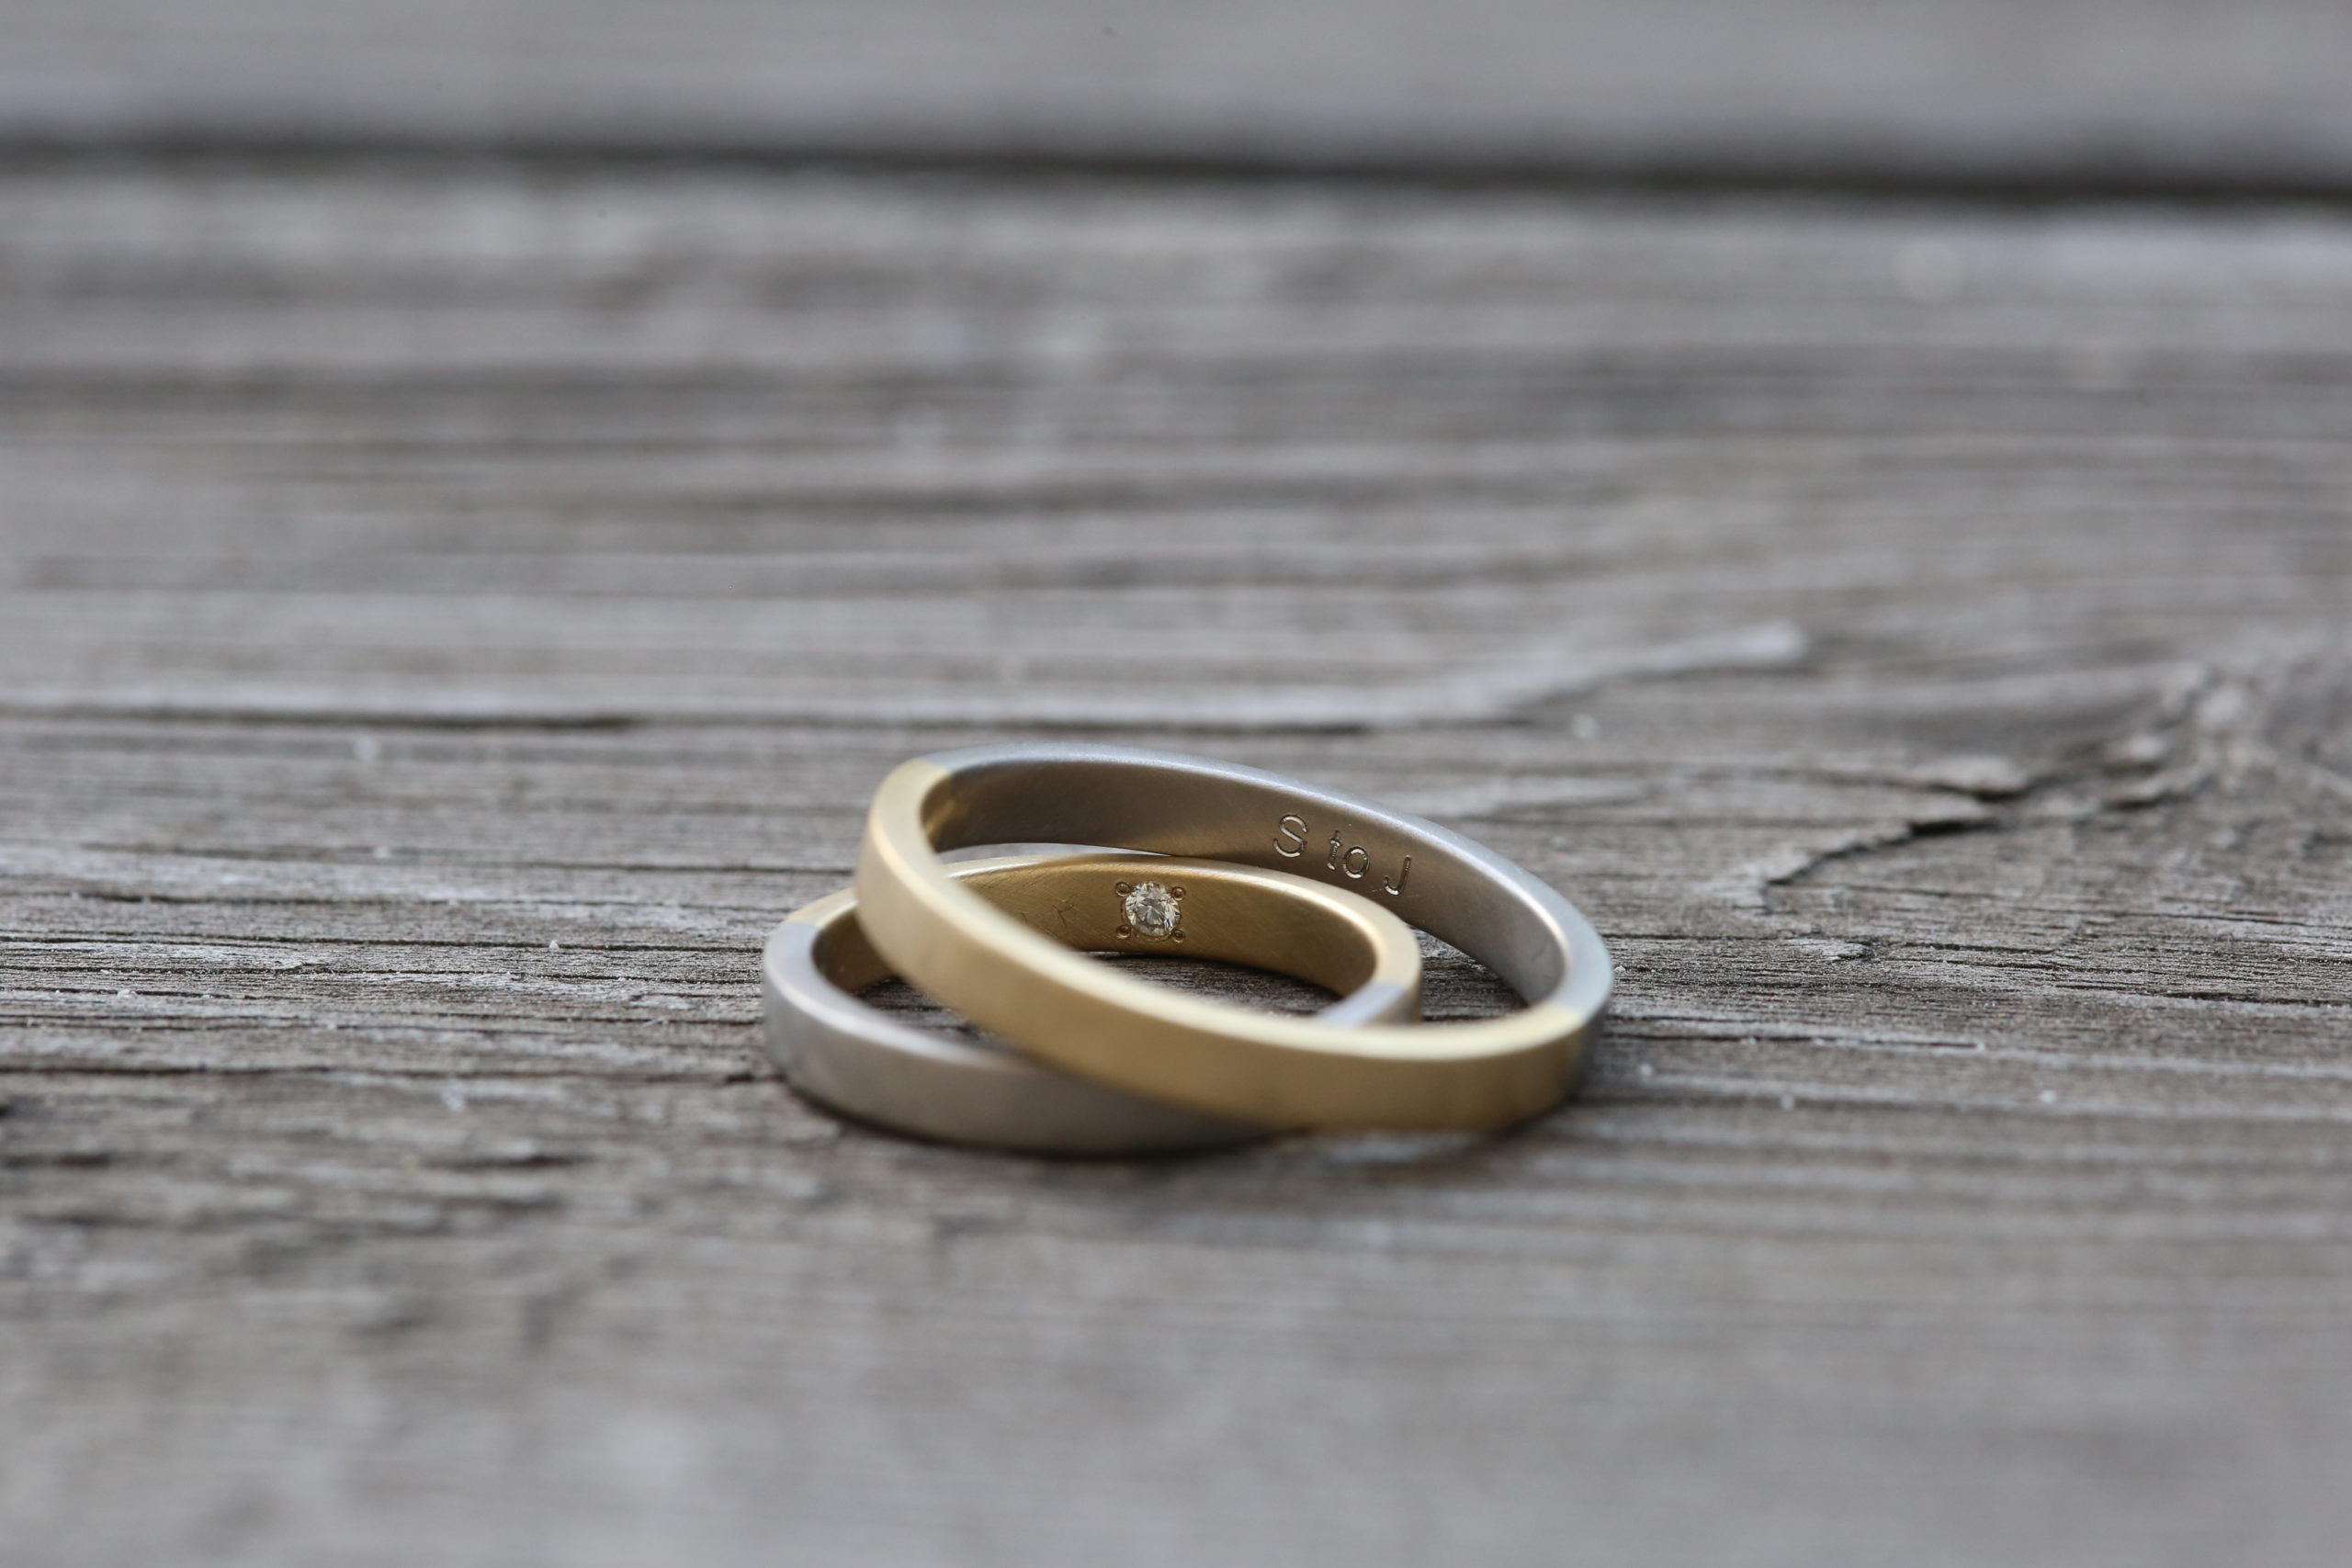 東京指輪工房の指輪